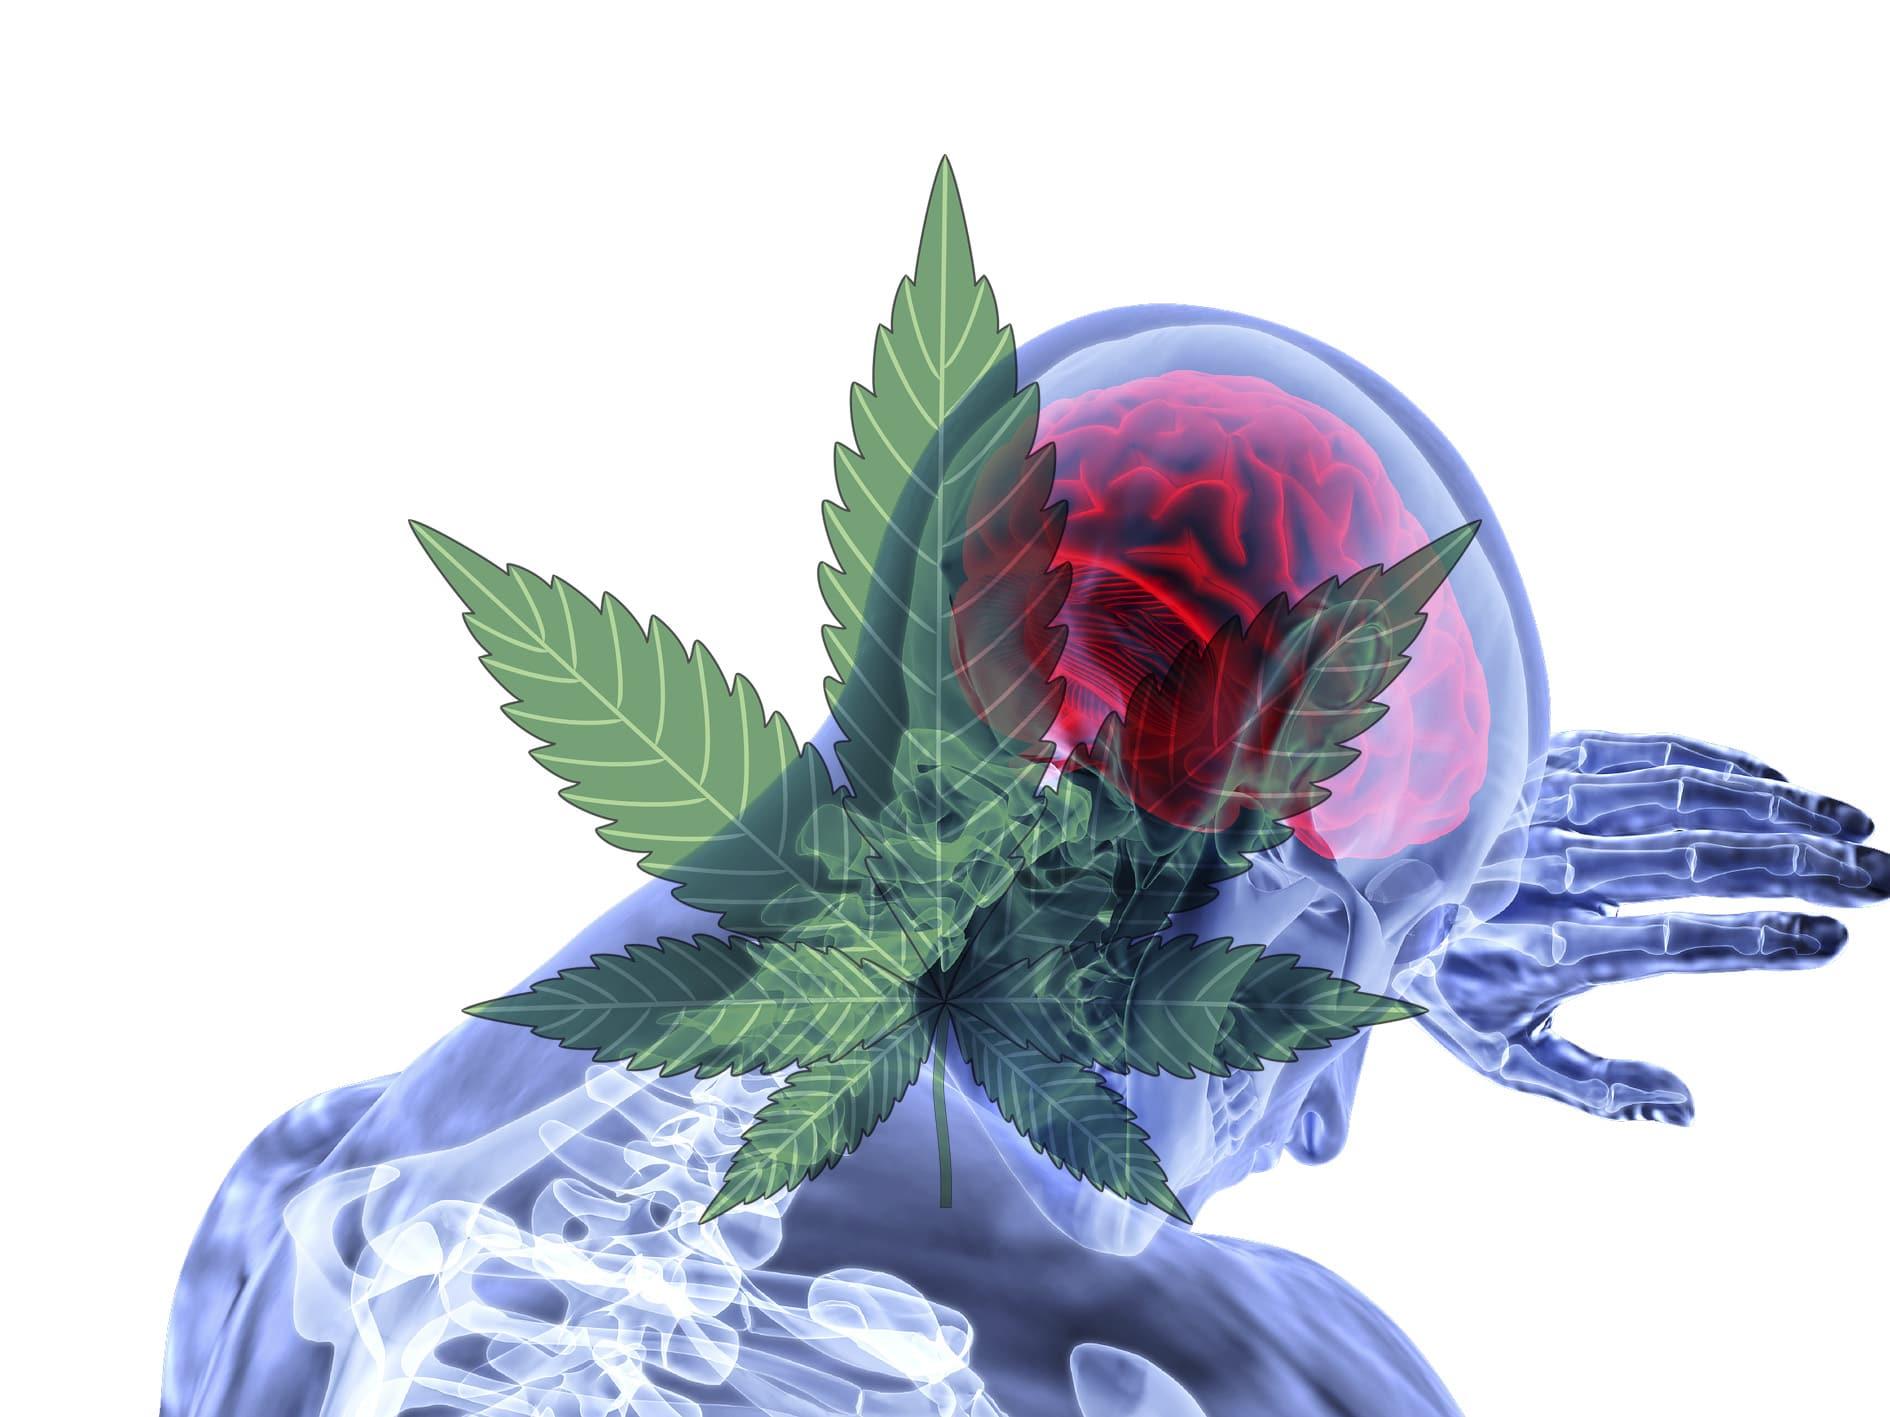 Nación Cannabis | Cannabis ayuda a reducir la inflamación